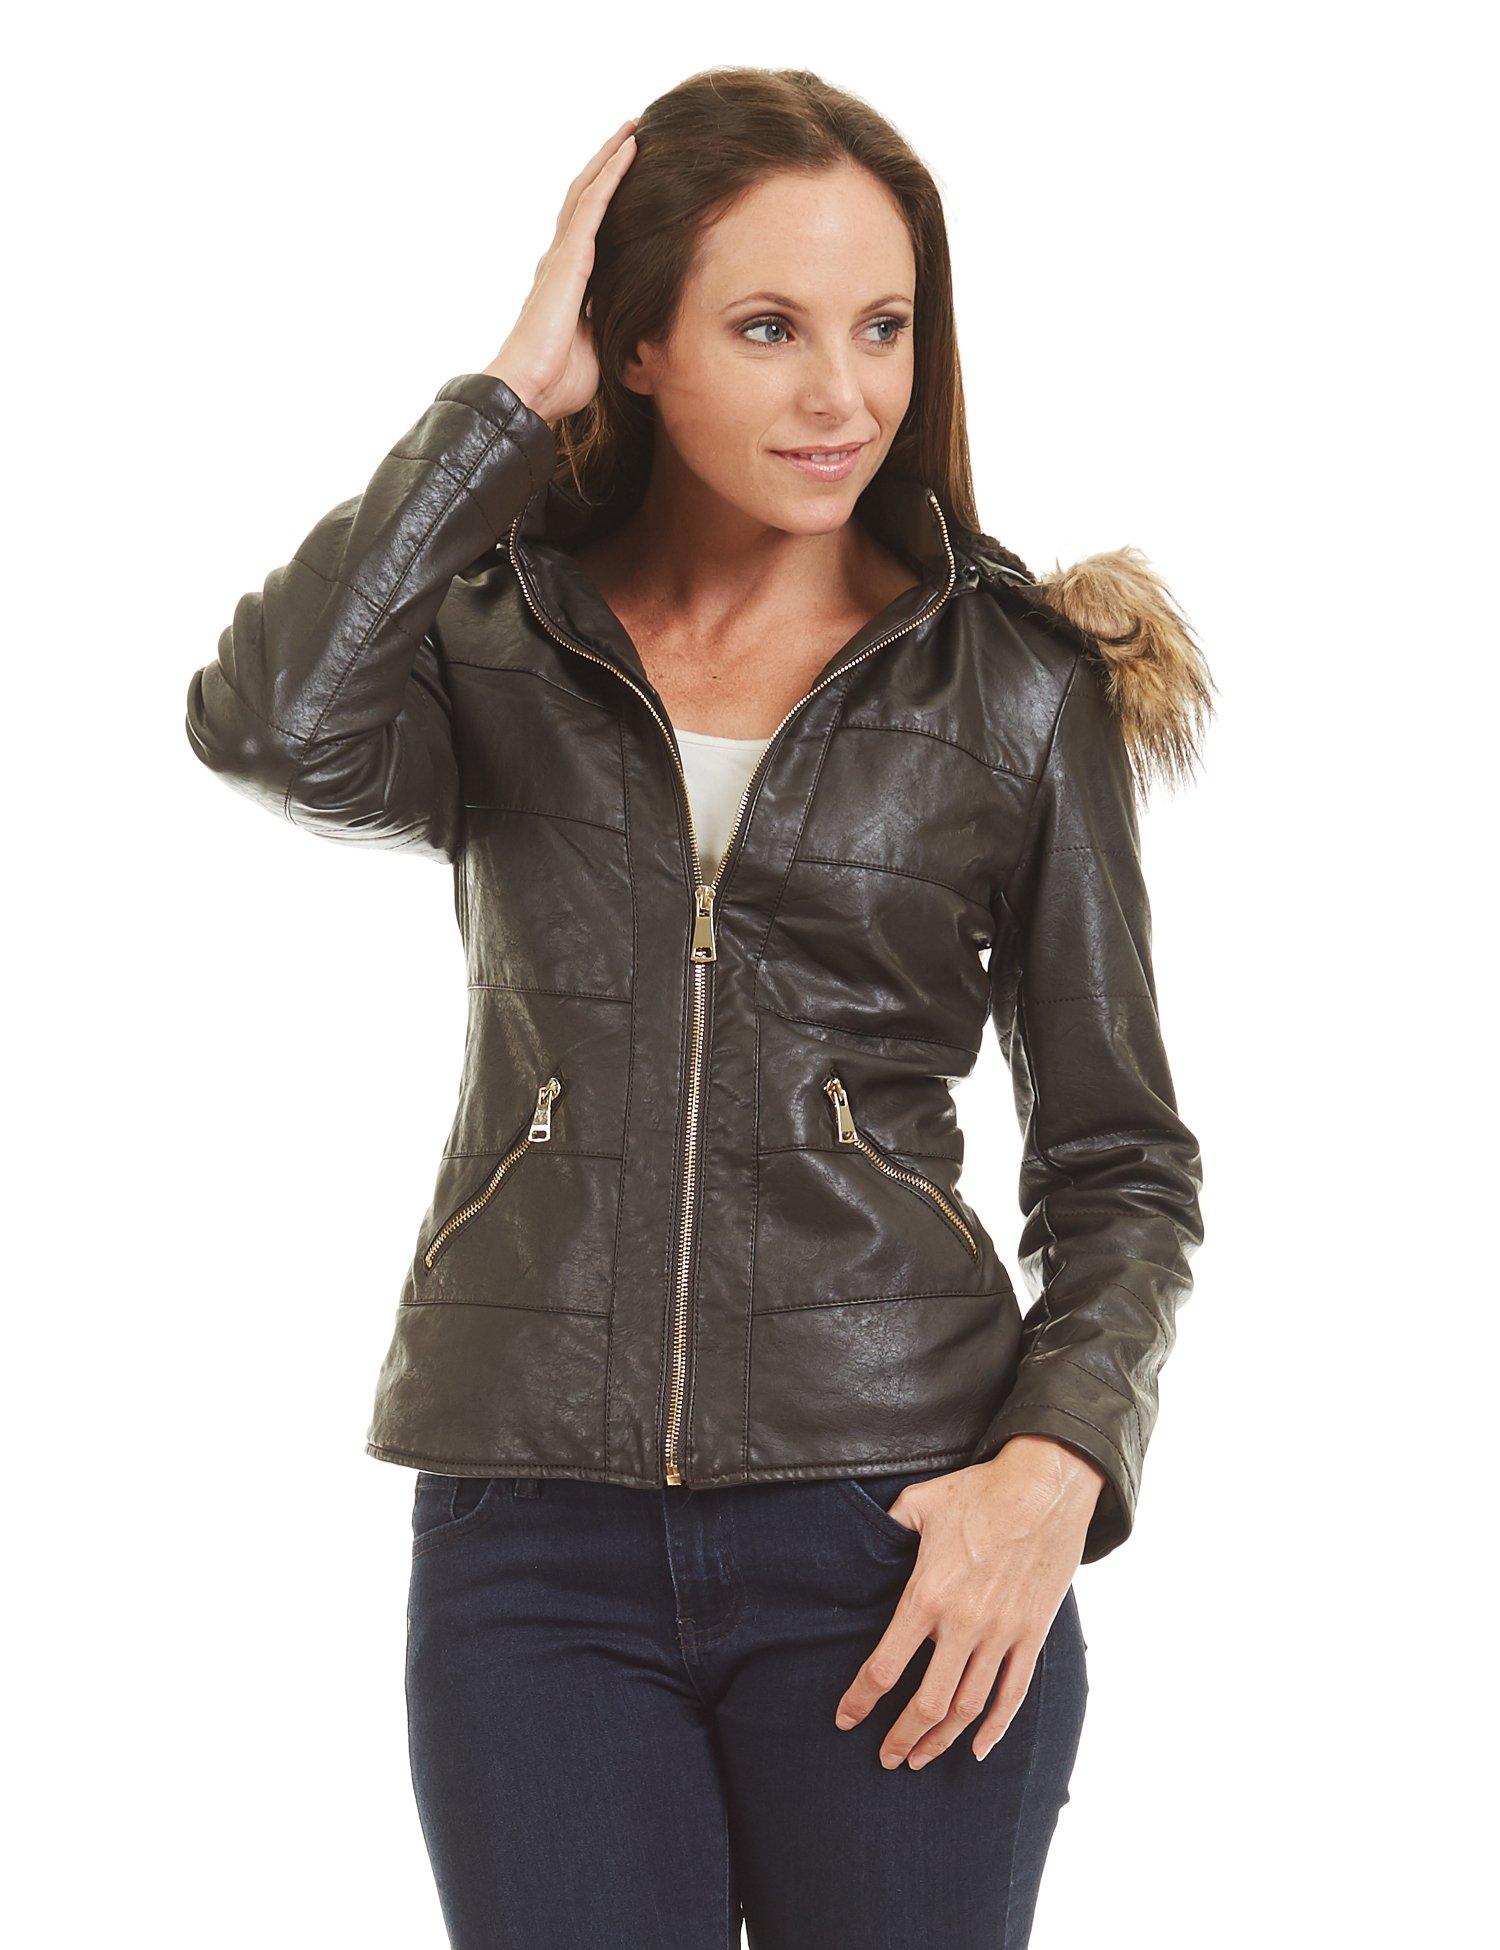 WJC1422 Womens Hodded Fur-Line Faux Leather Jacket L Coffee